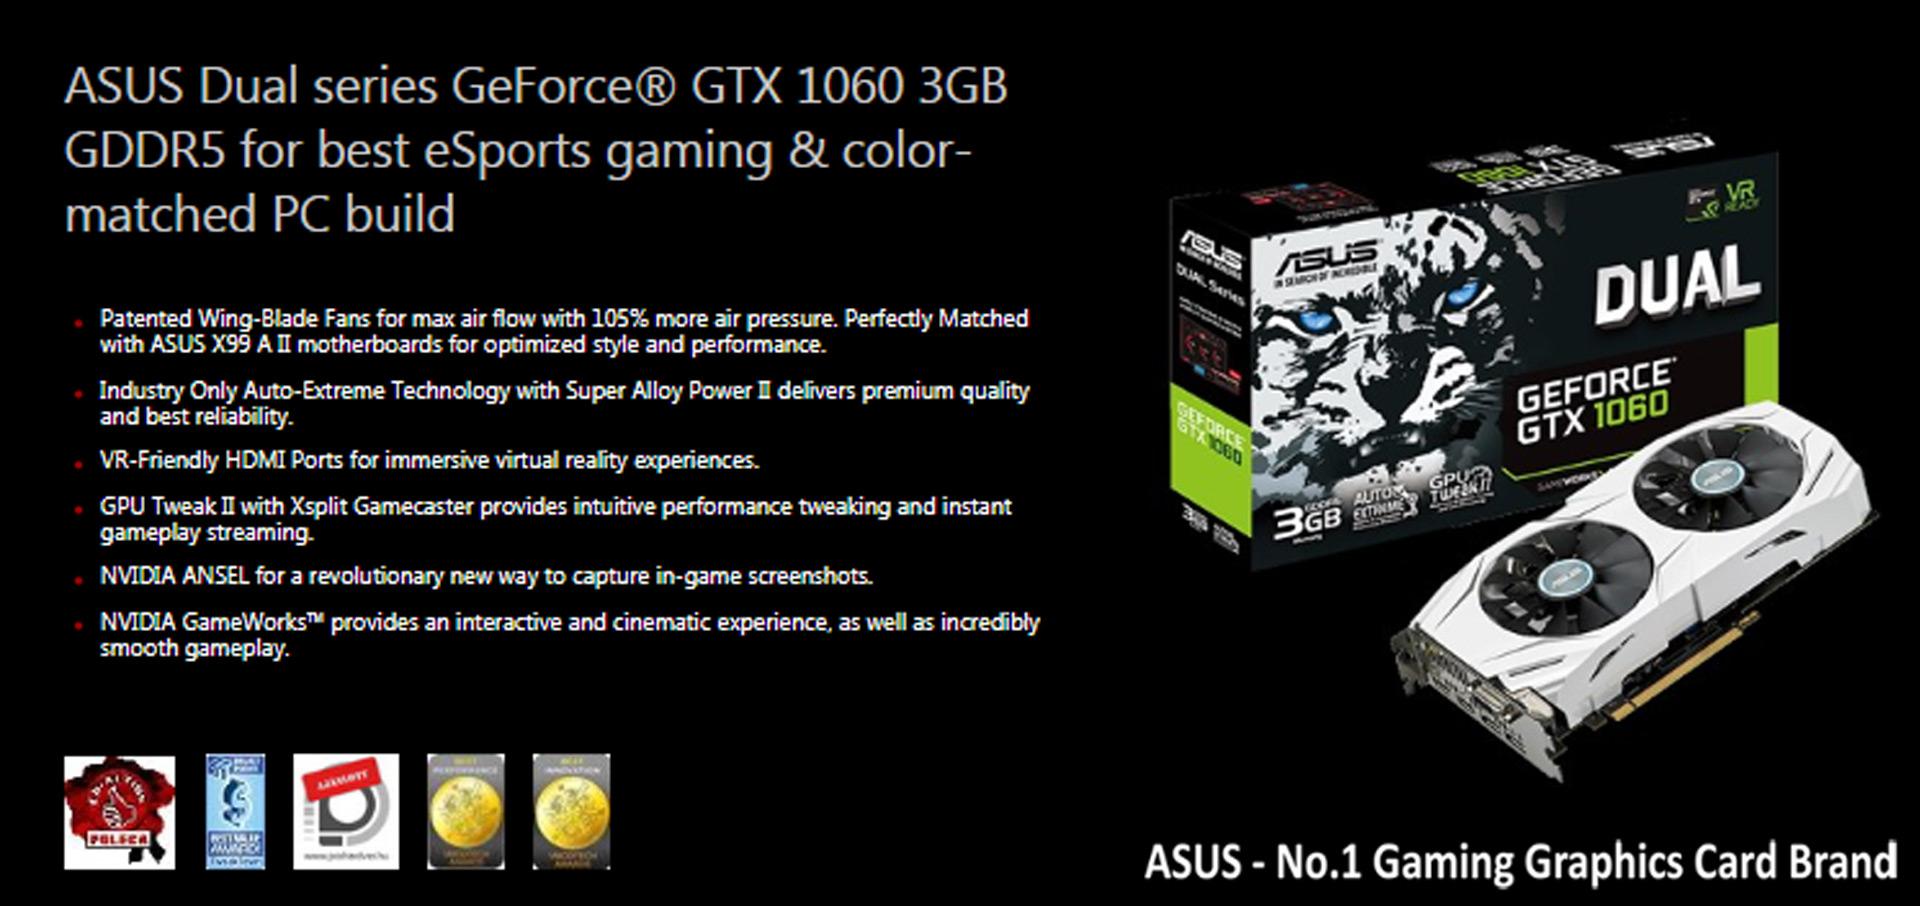 Asus Graphics Card Pascal Series GTX 1060 Dual Edition 3GB GDDR5